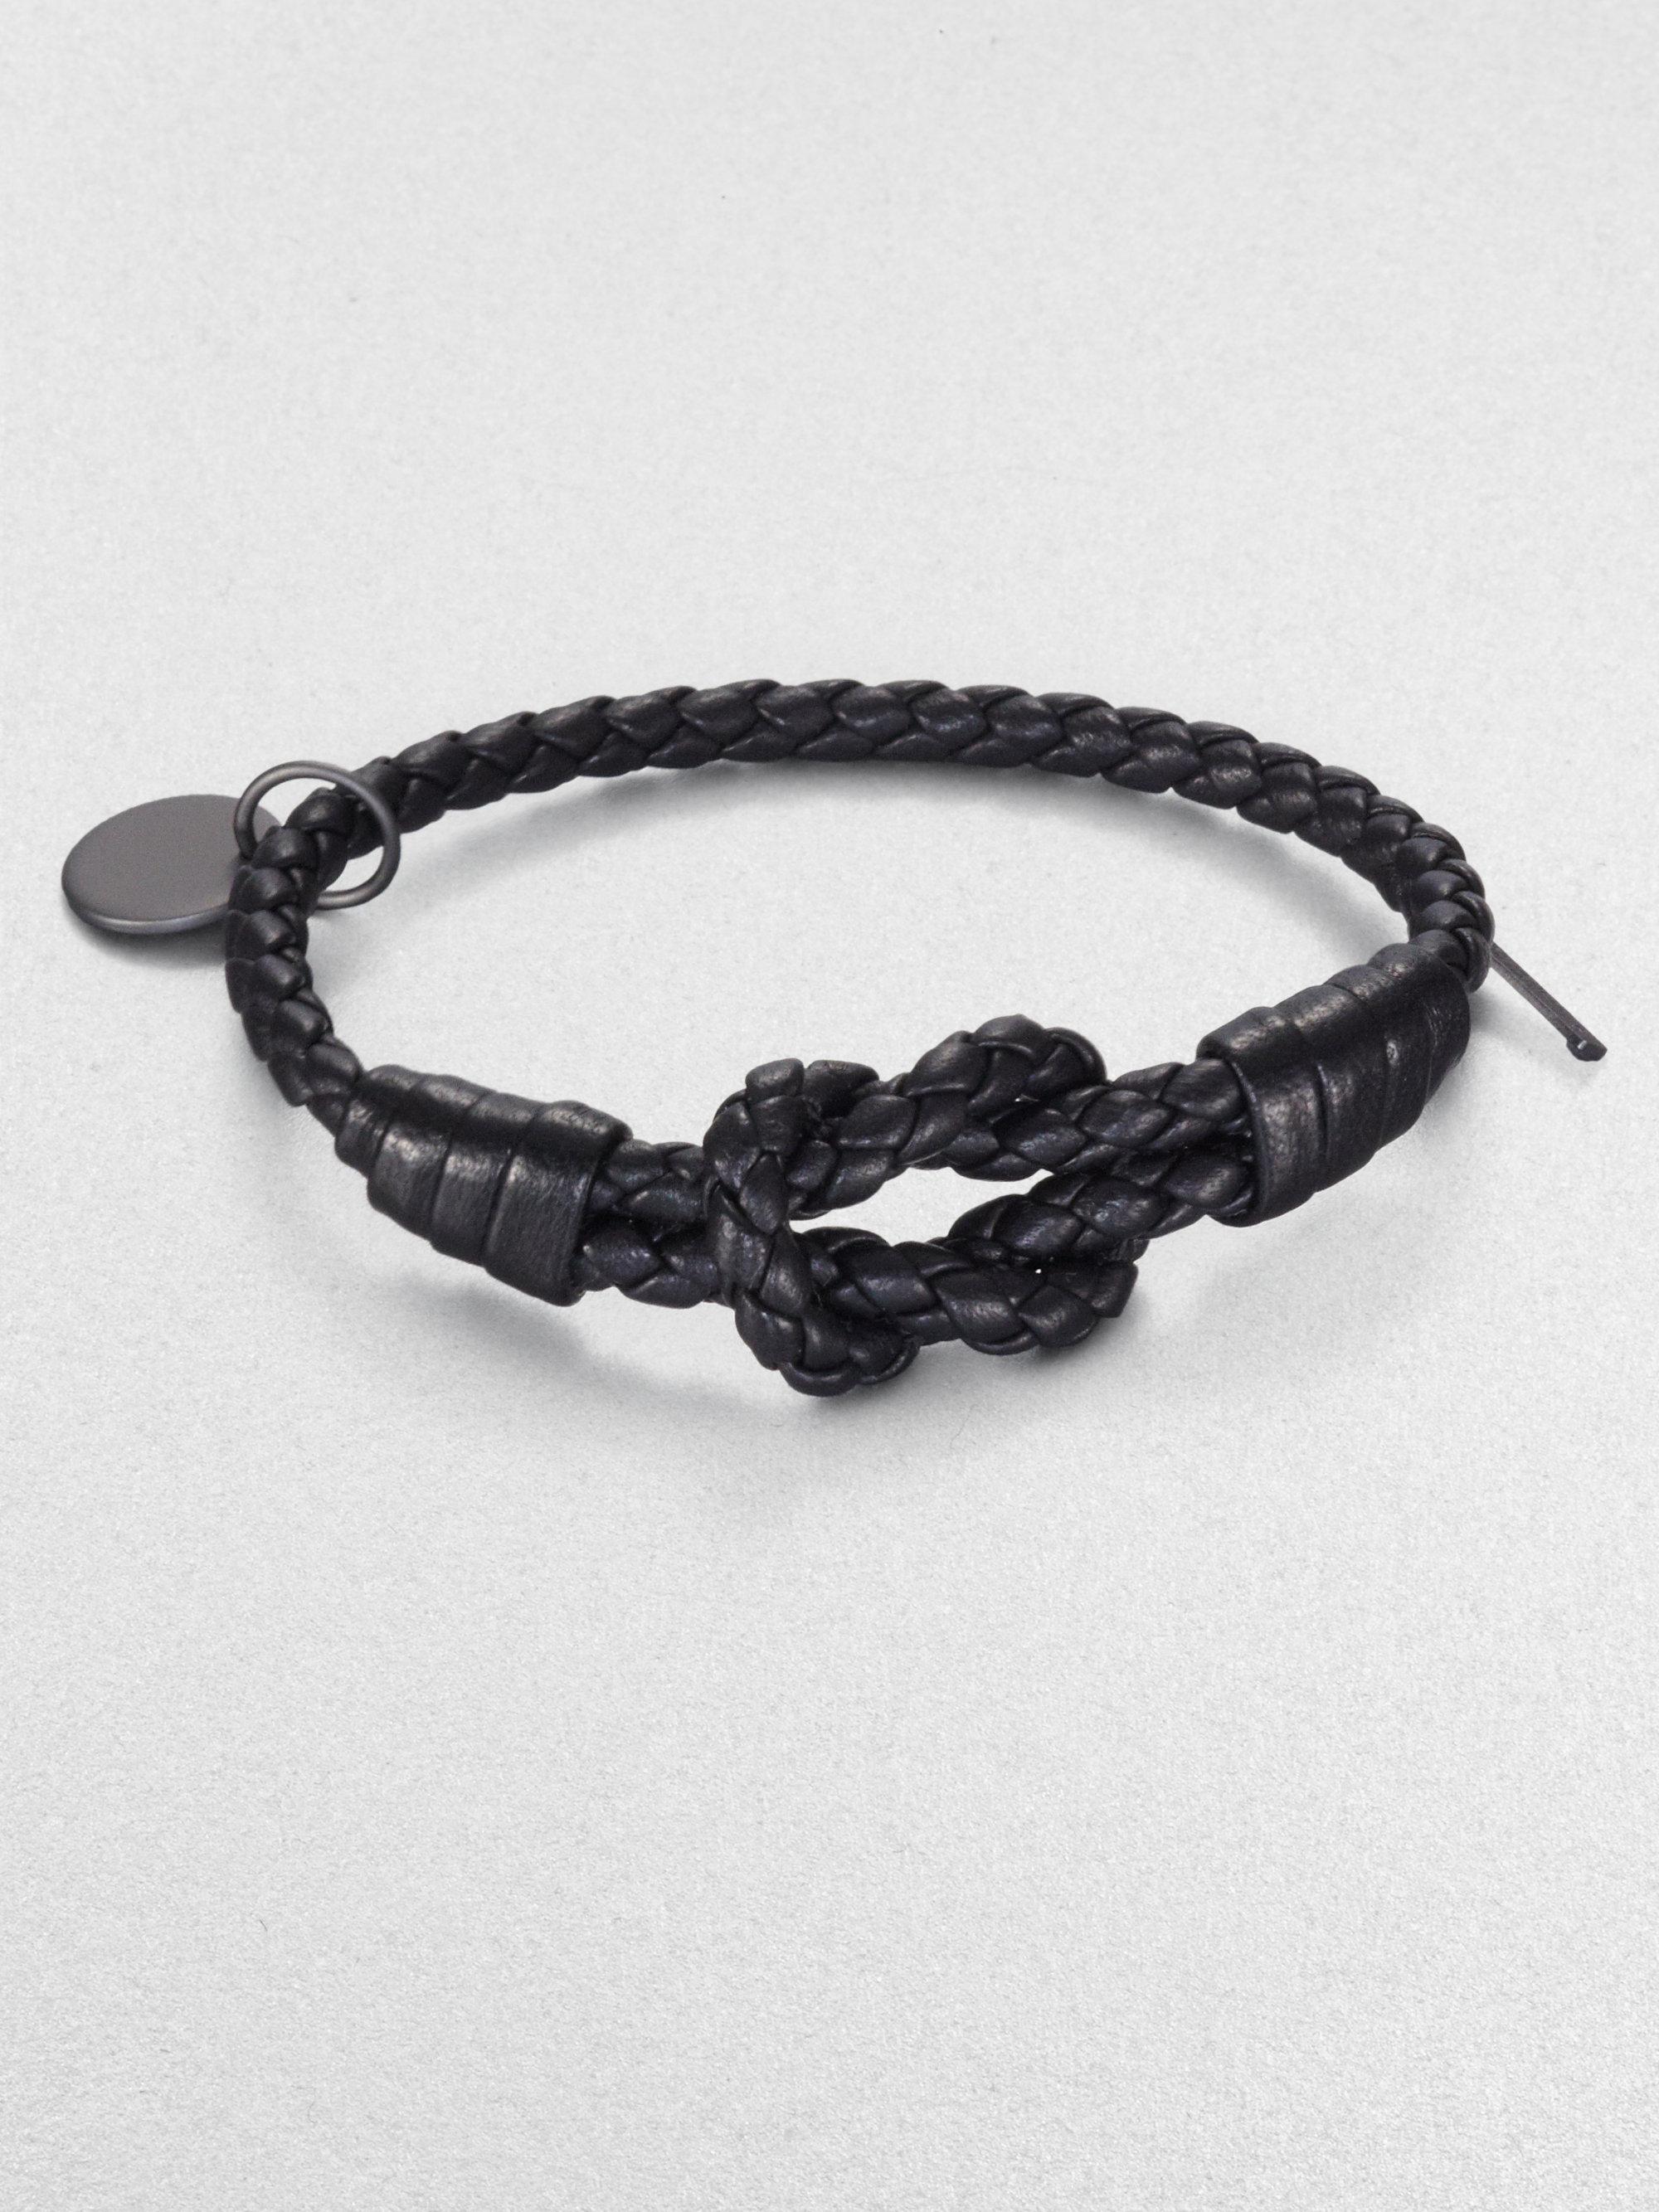 Bottega Veneta Knot intrecciato leather bracelet KOY73